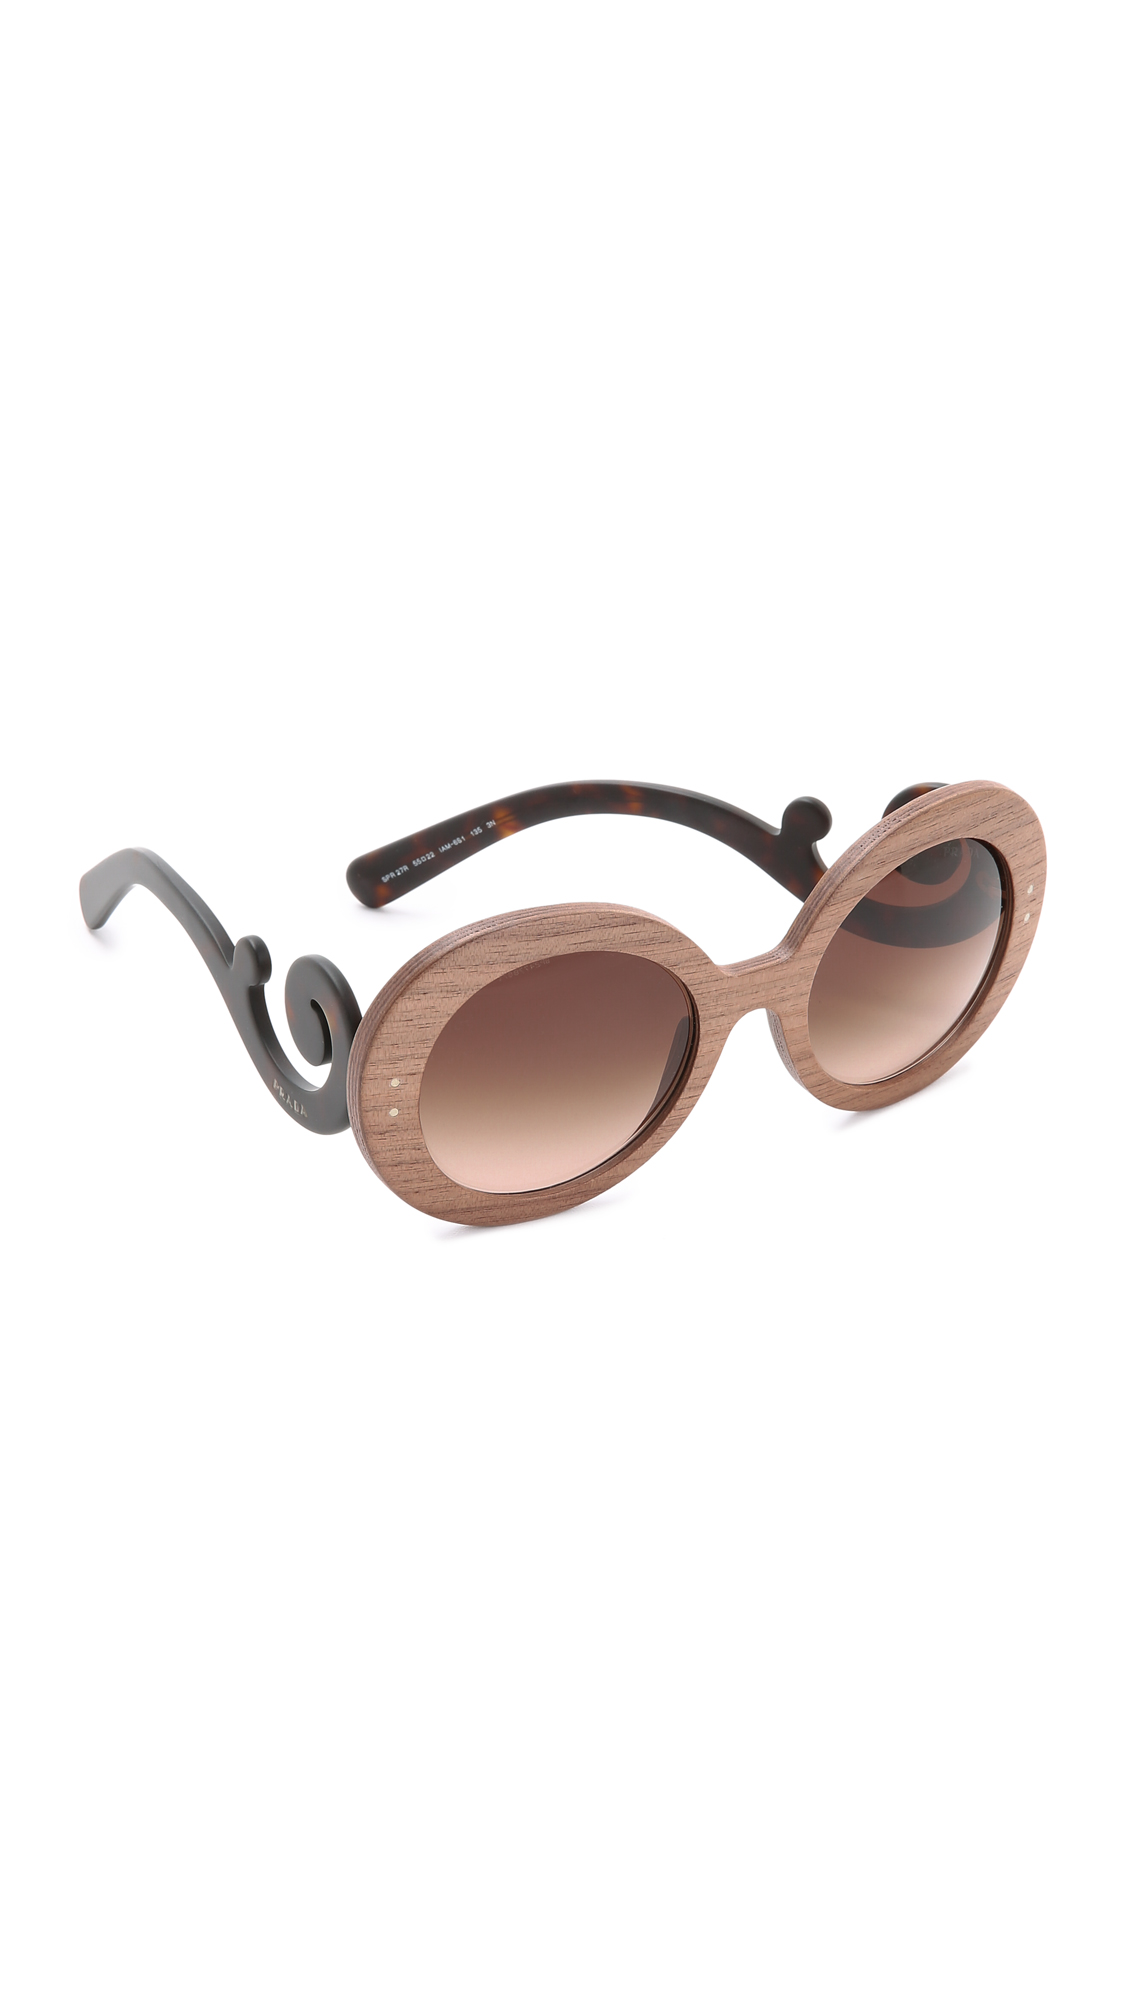 ffa53a9450 Prada Wood Sunglasses